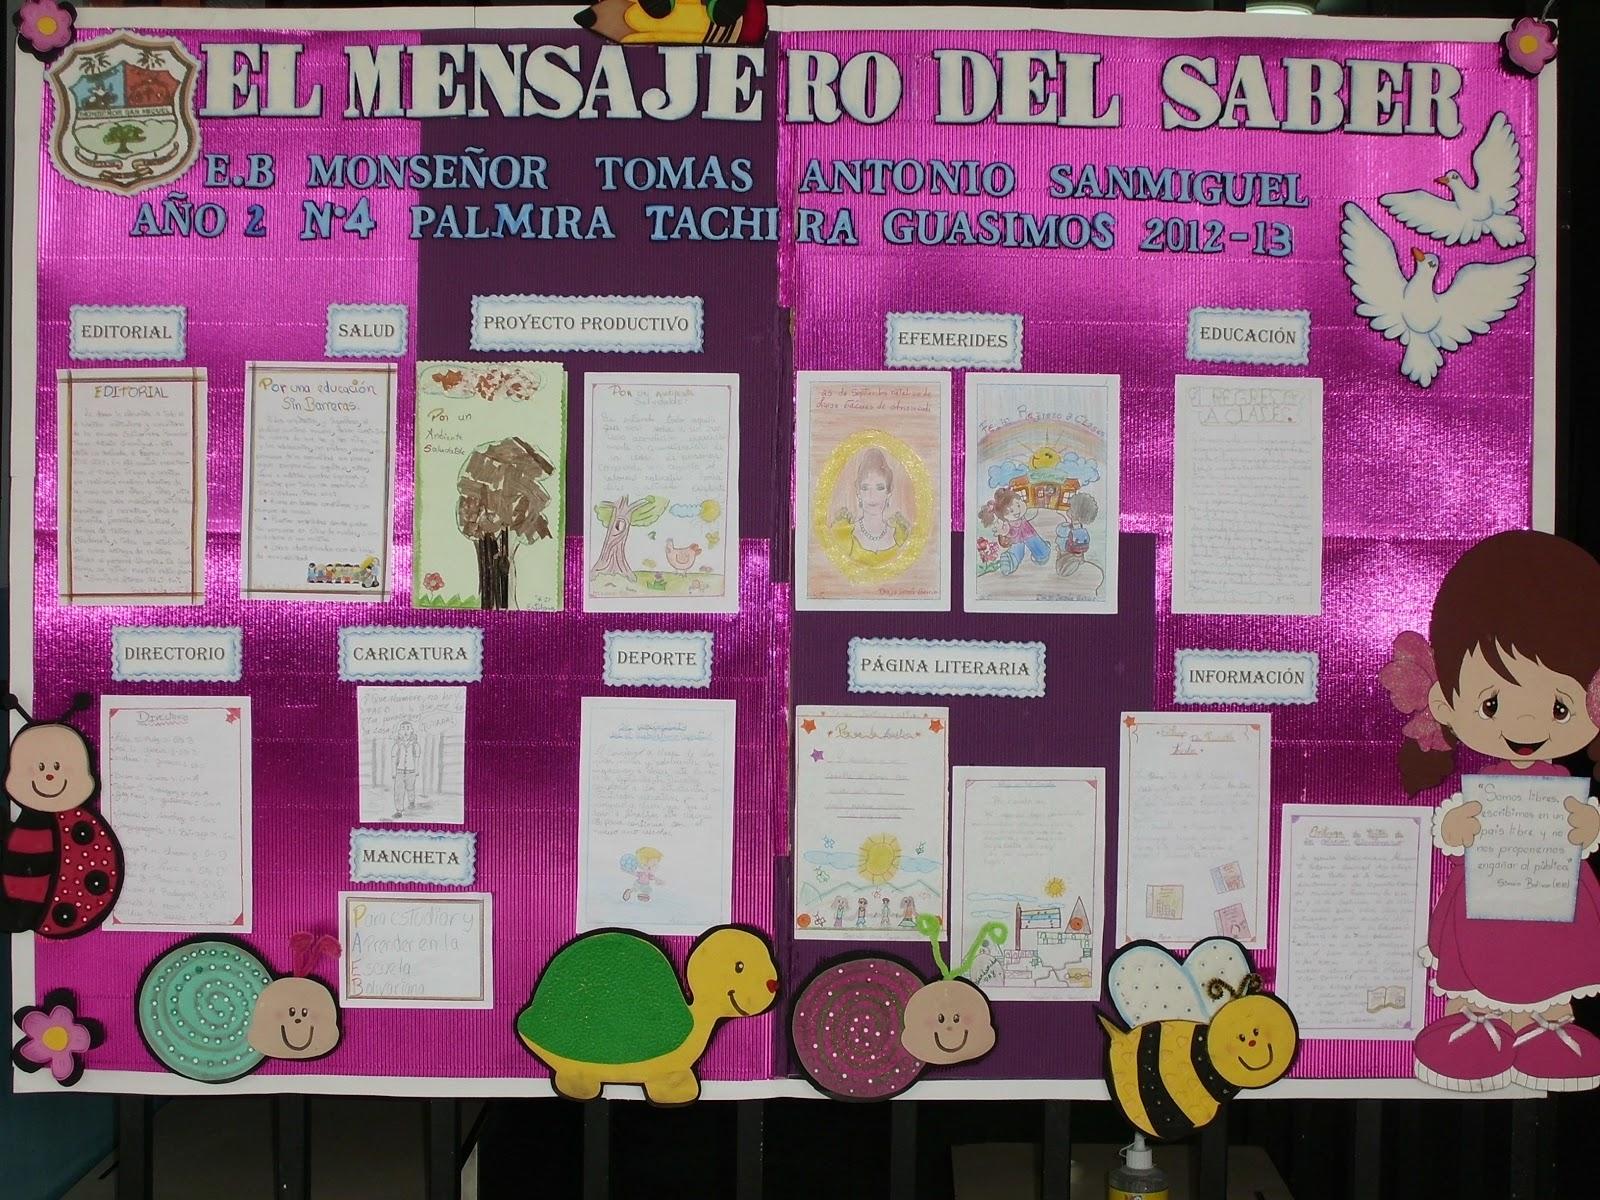 Escuela bolivariana monse or tom s antonio sanmiguel otra for Estructura del periodico mural